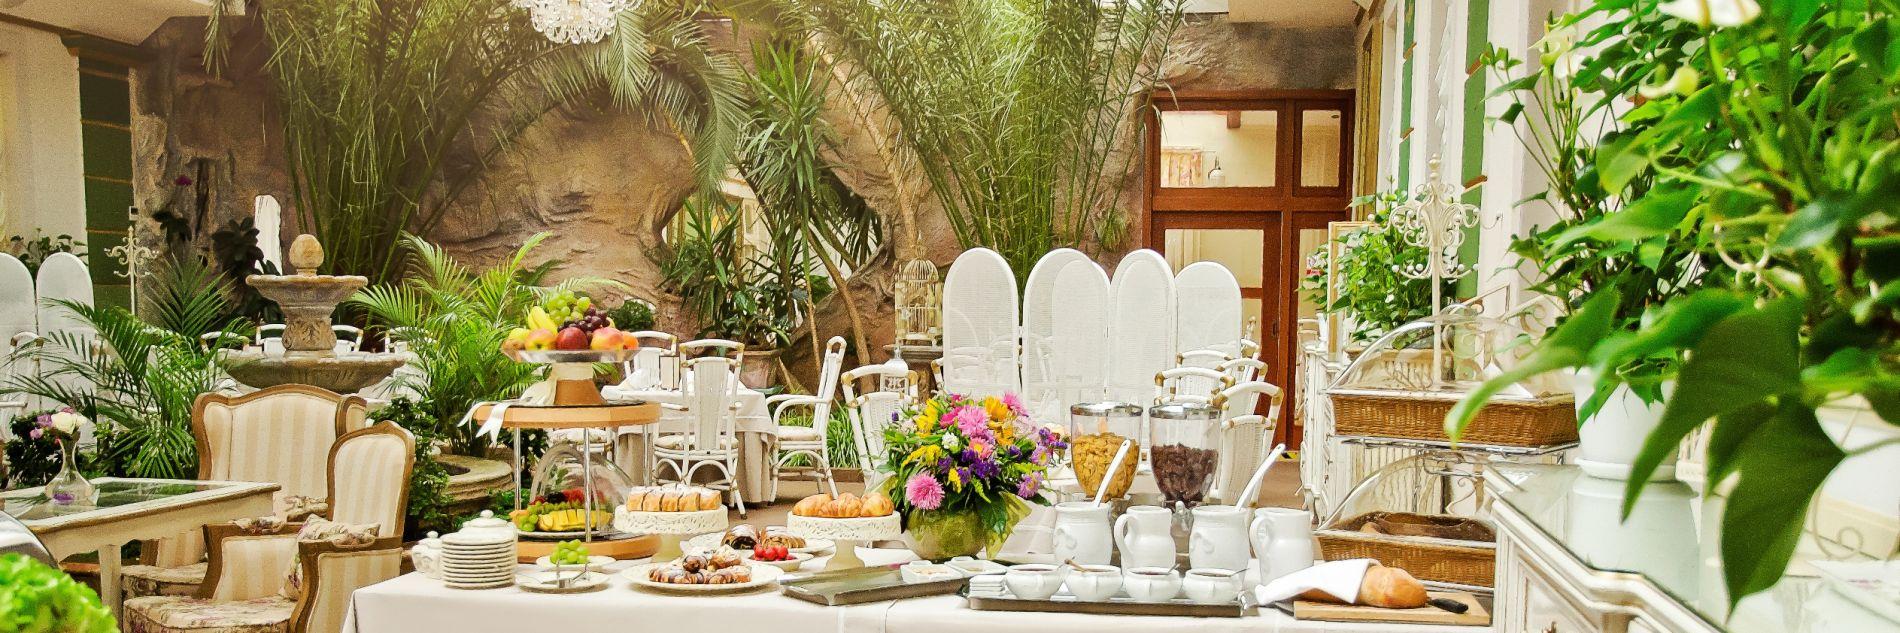 Peci lne ponuky golden royal boutique hotel spa for Boutique hotel ani